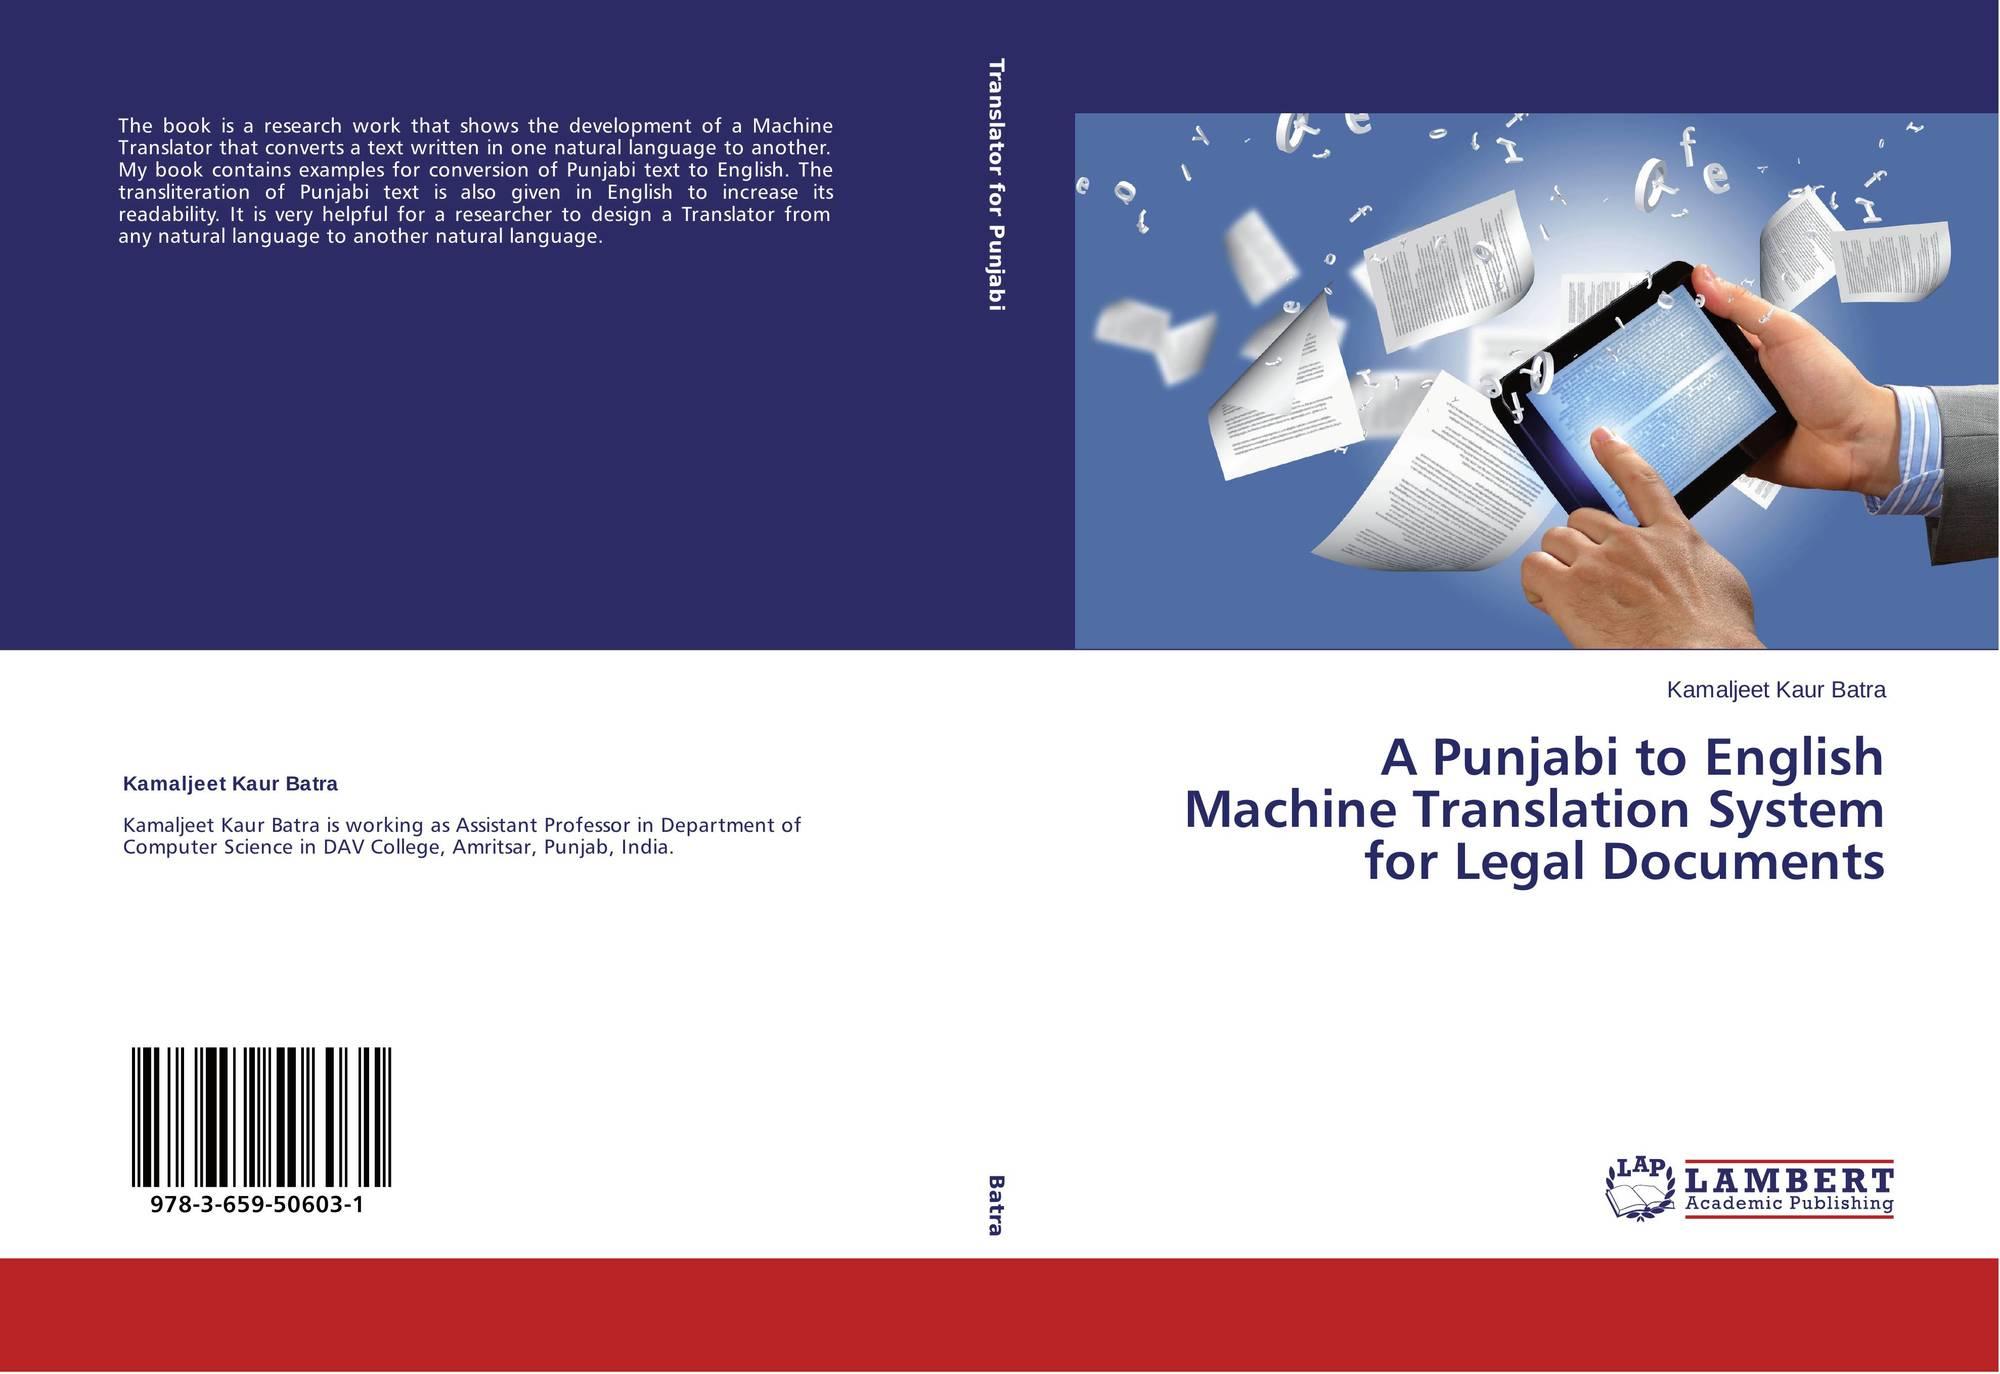 A Punjabi to English Machine Translation System for Legal Documents